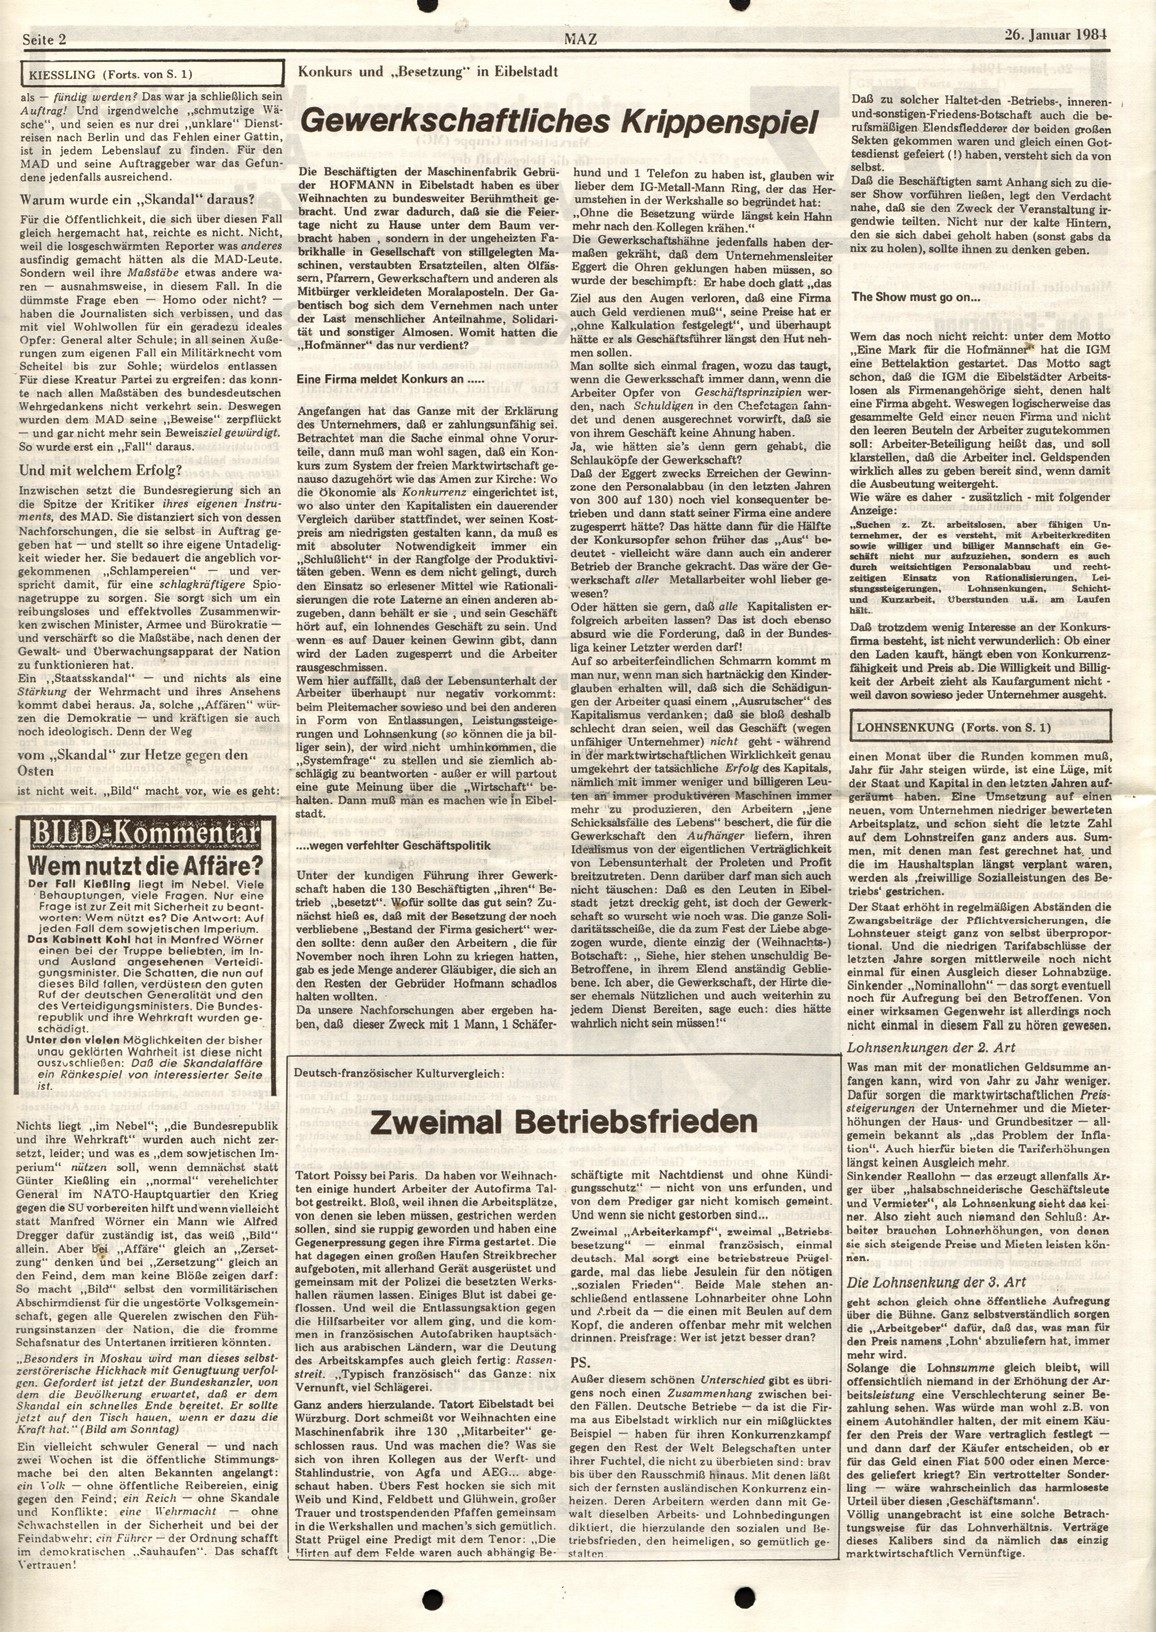 Nuernberg_MG_MAZ_MAN_19840126_02